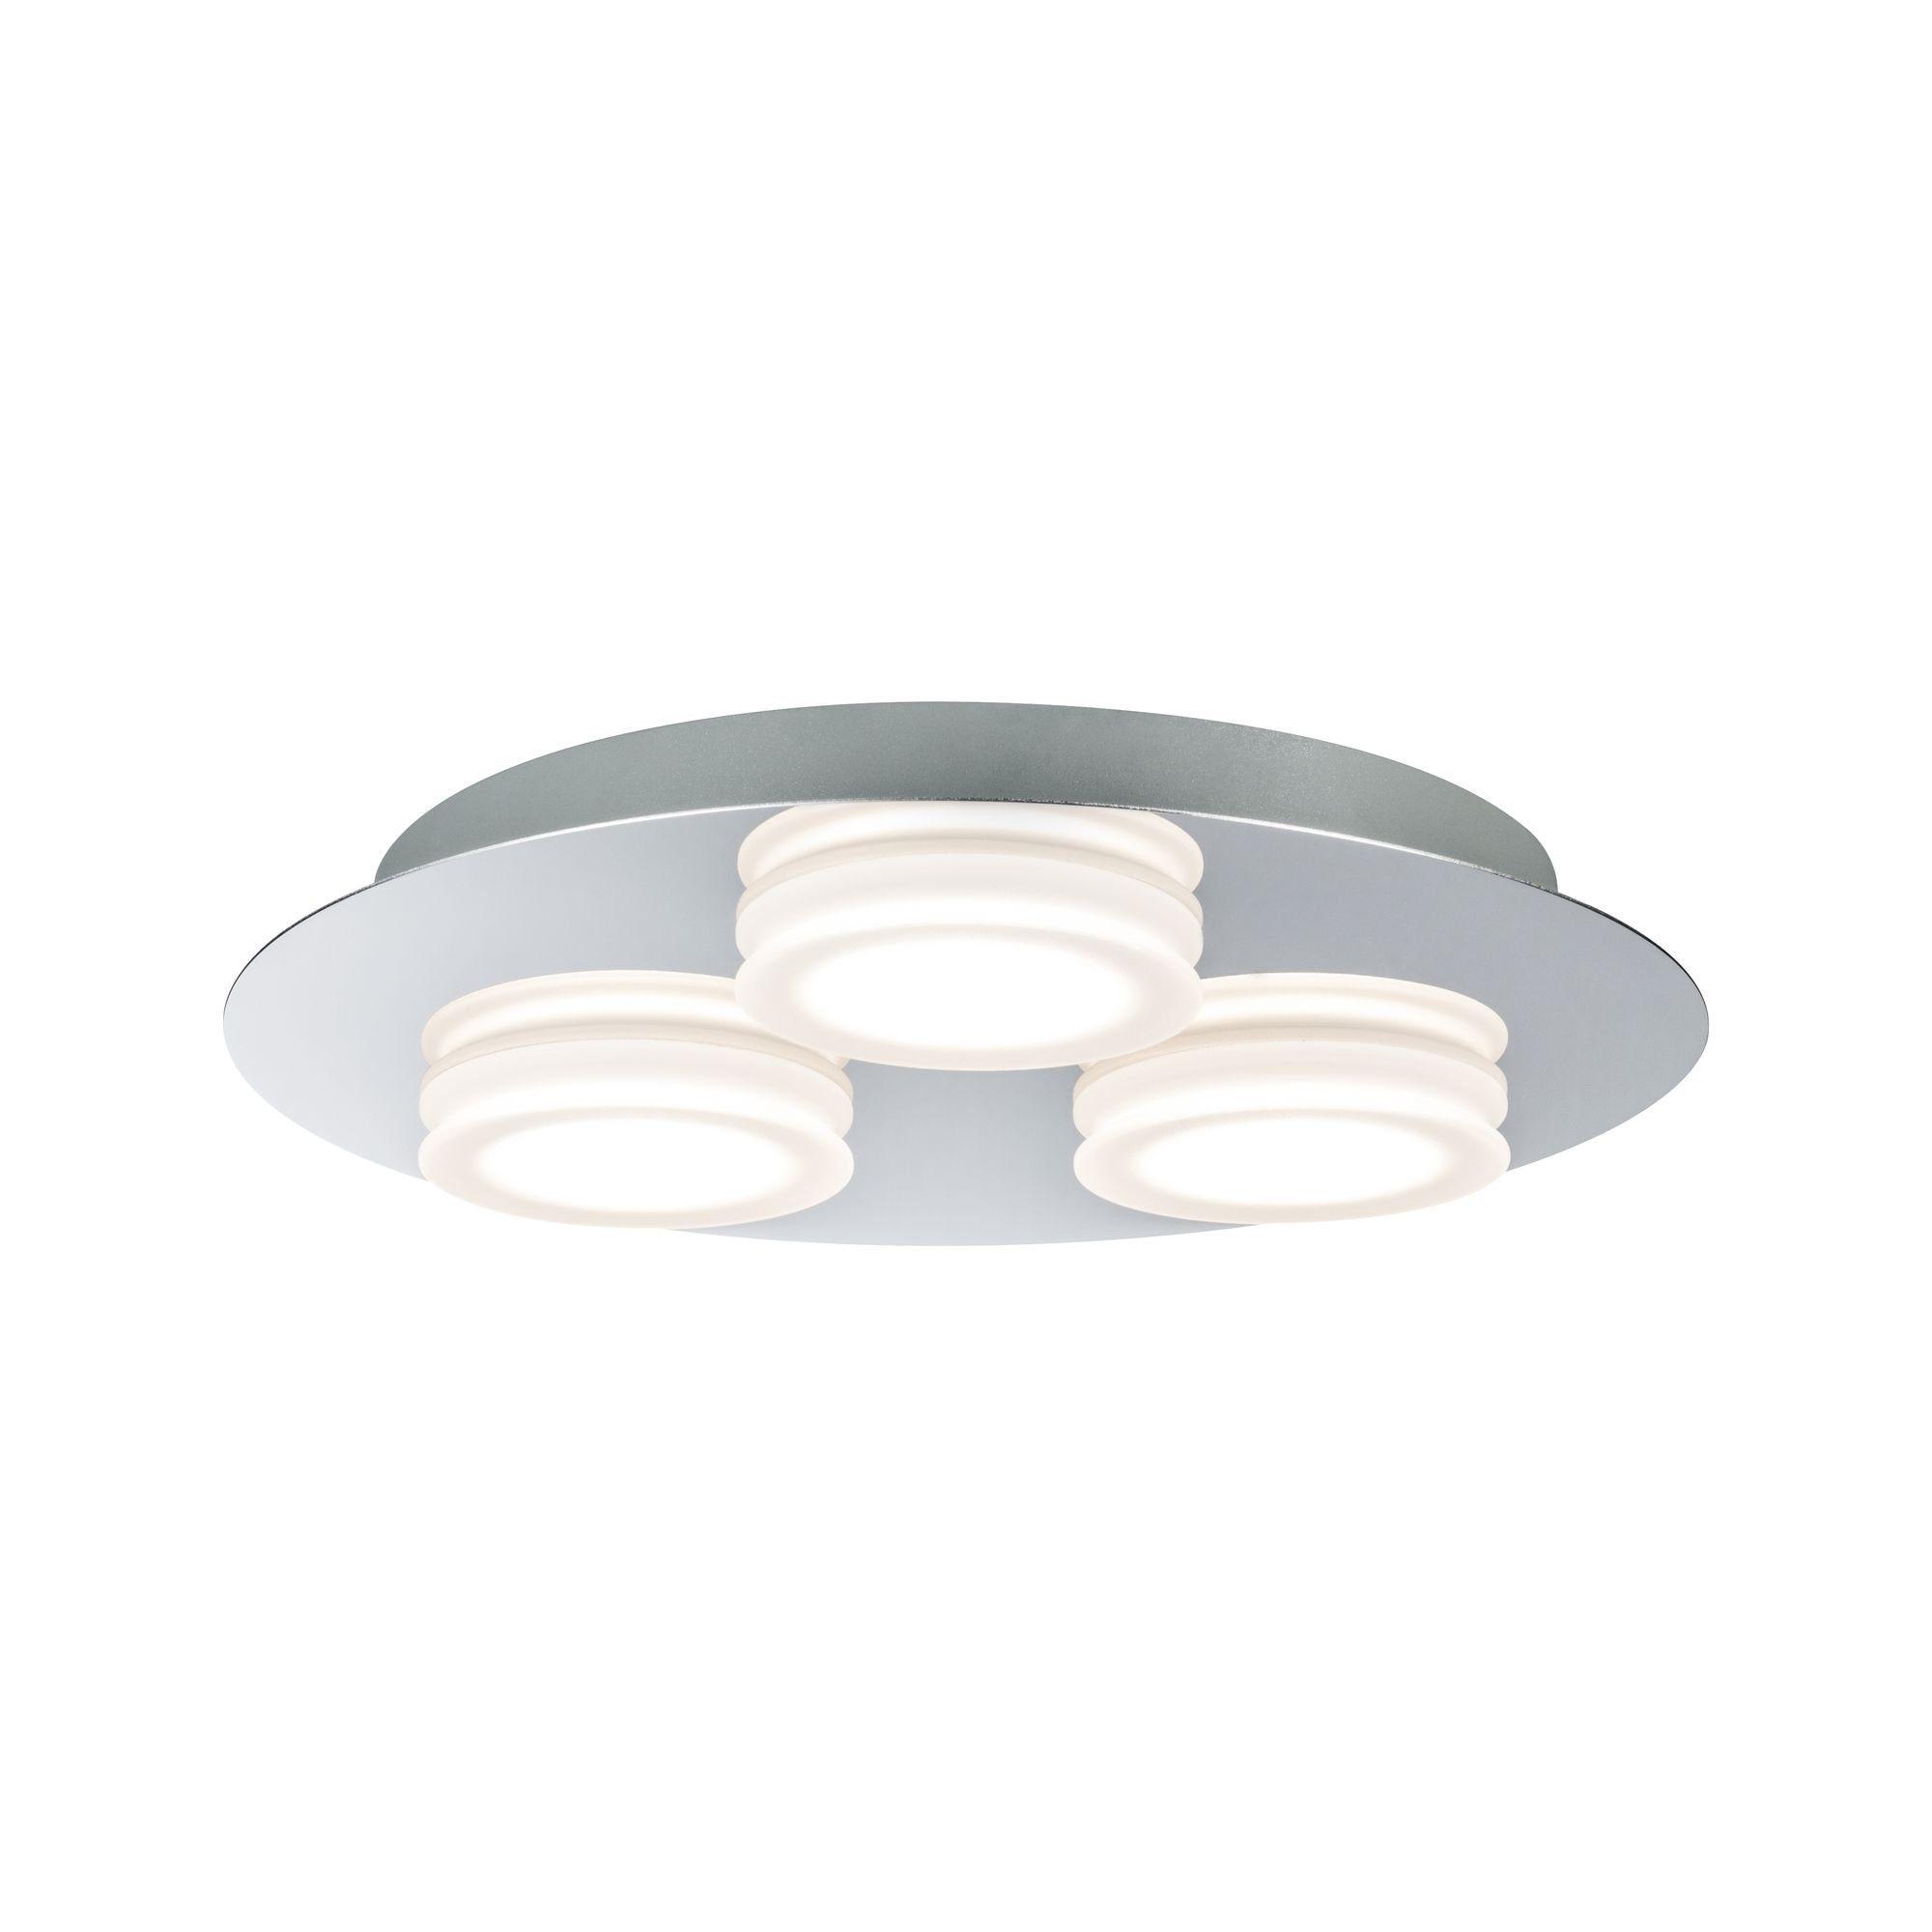 Paulmann LED Deckenleuchte Doradus 3x4,7W Chrom, 1 St., Warmweiß